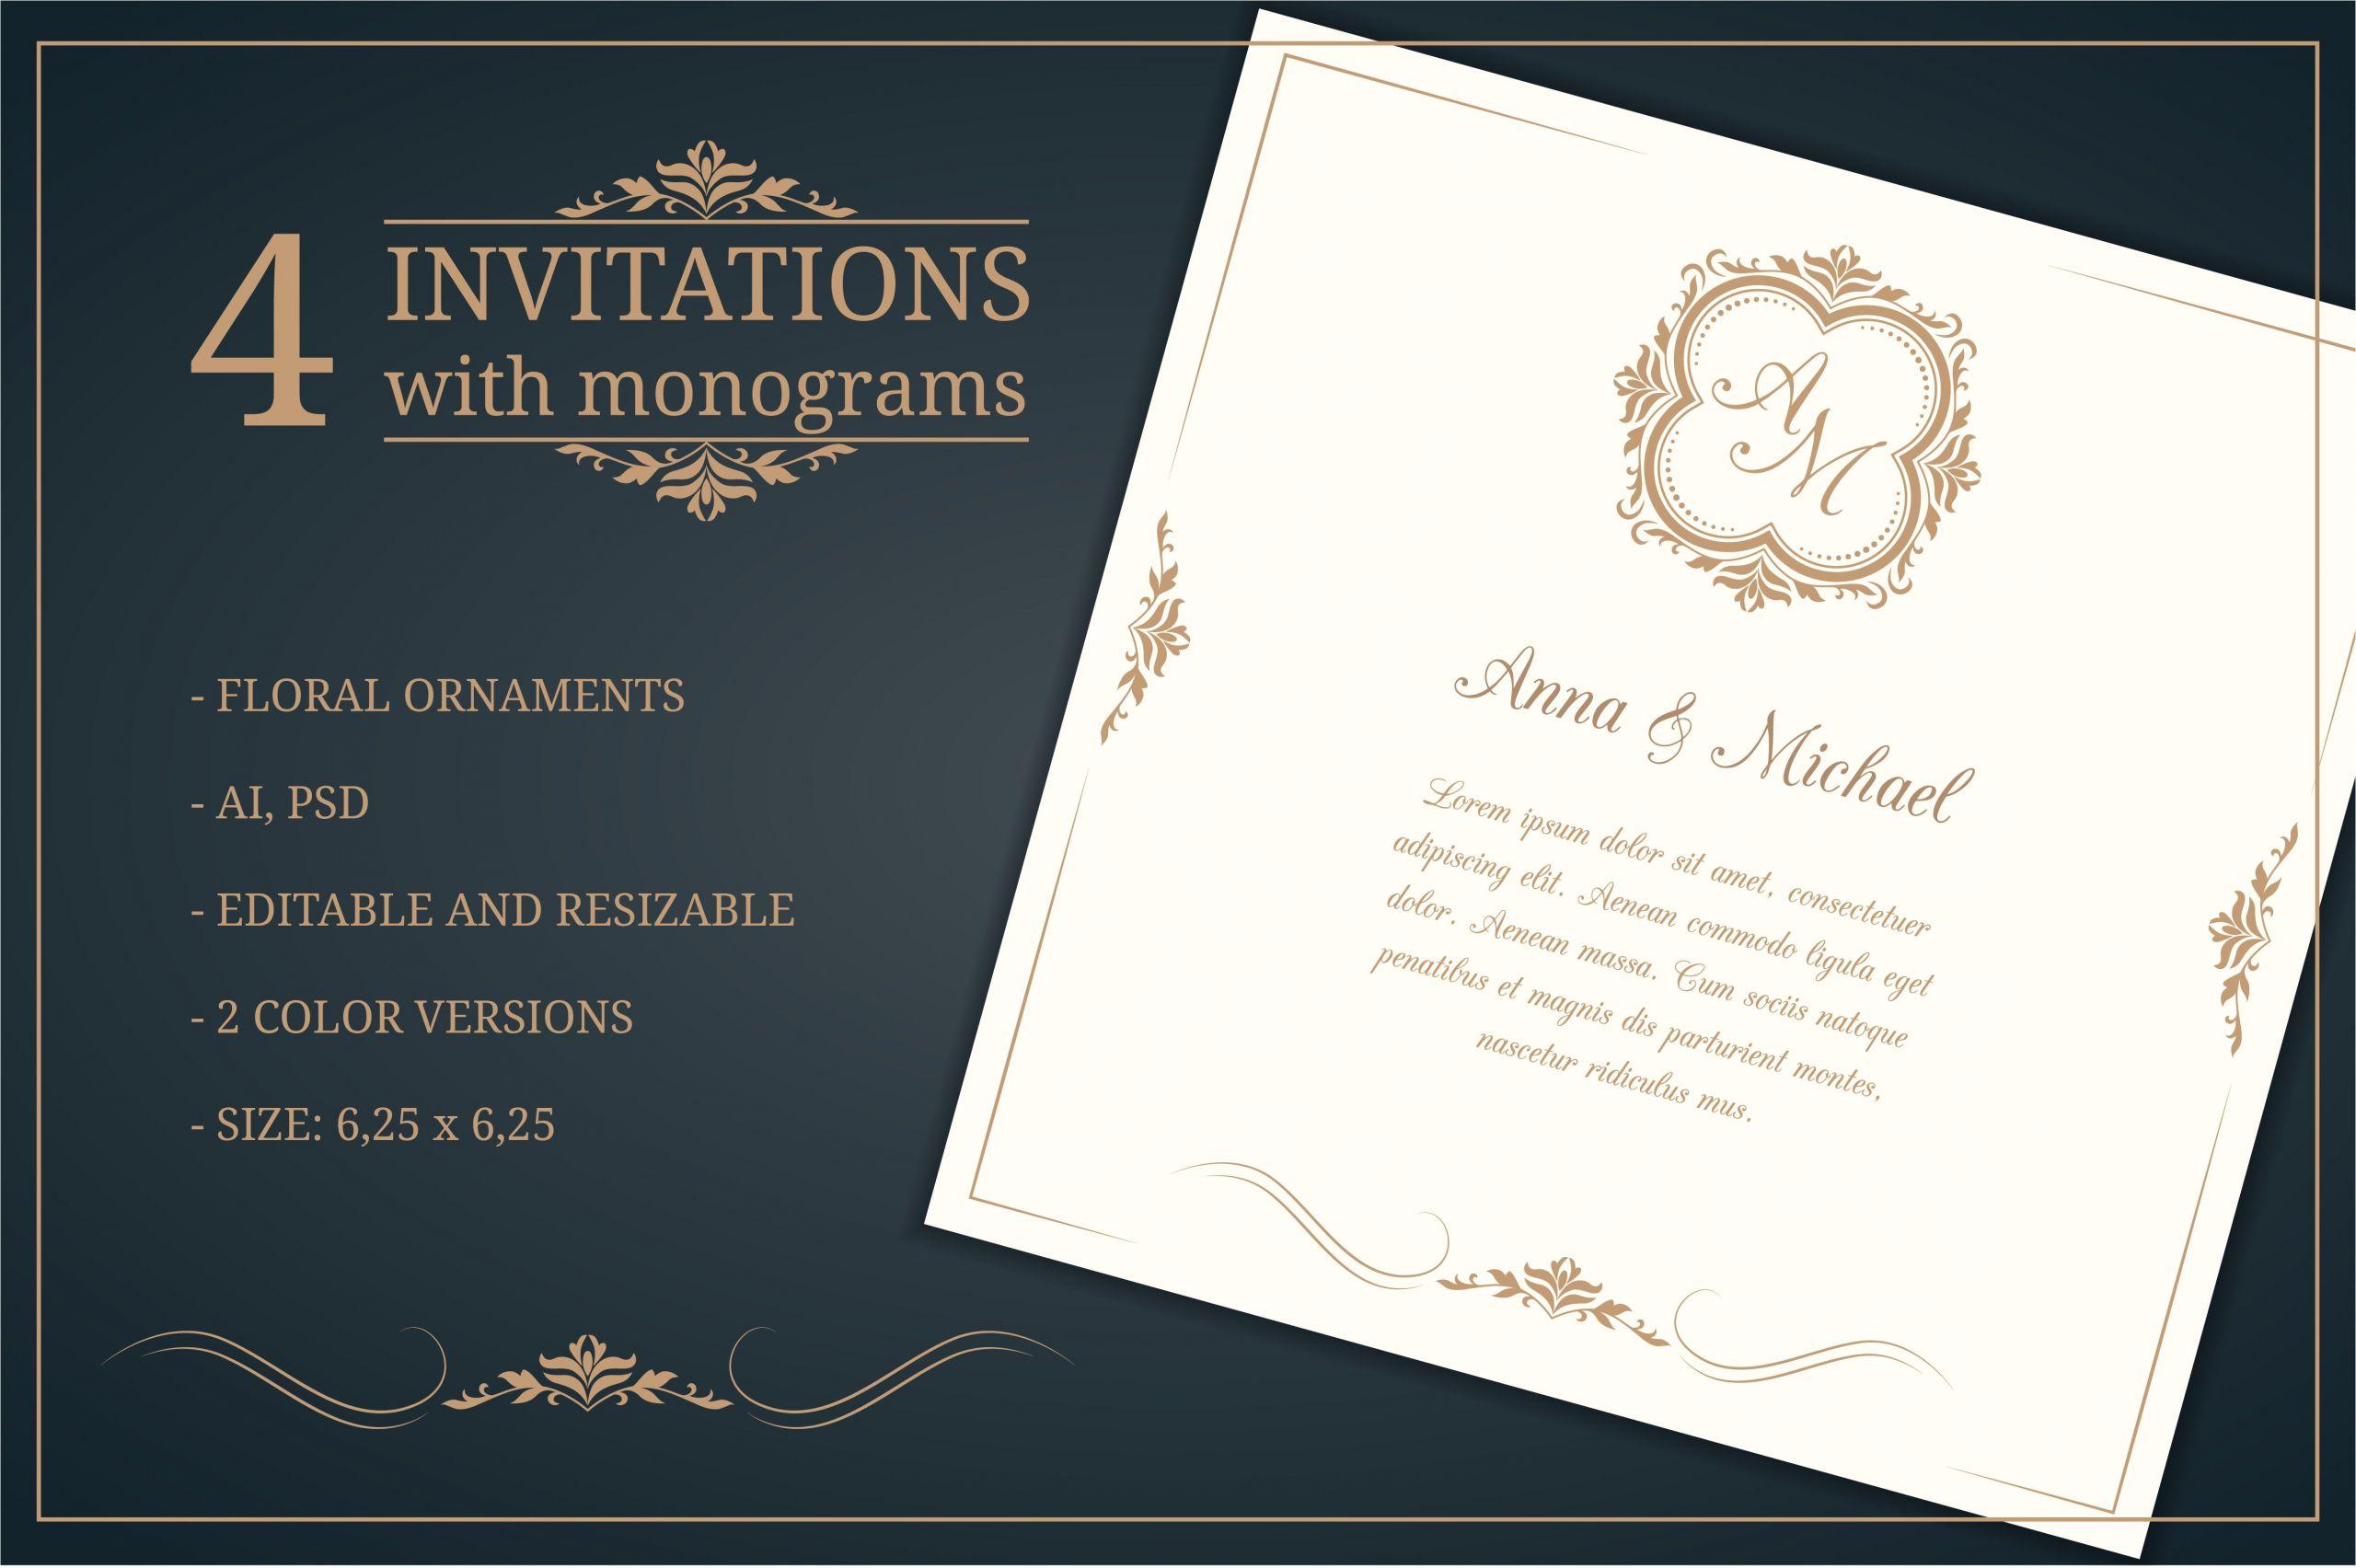 478559 wedding invitations with monograms